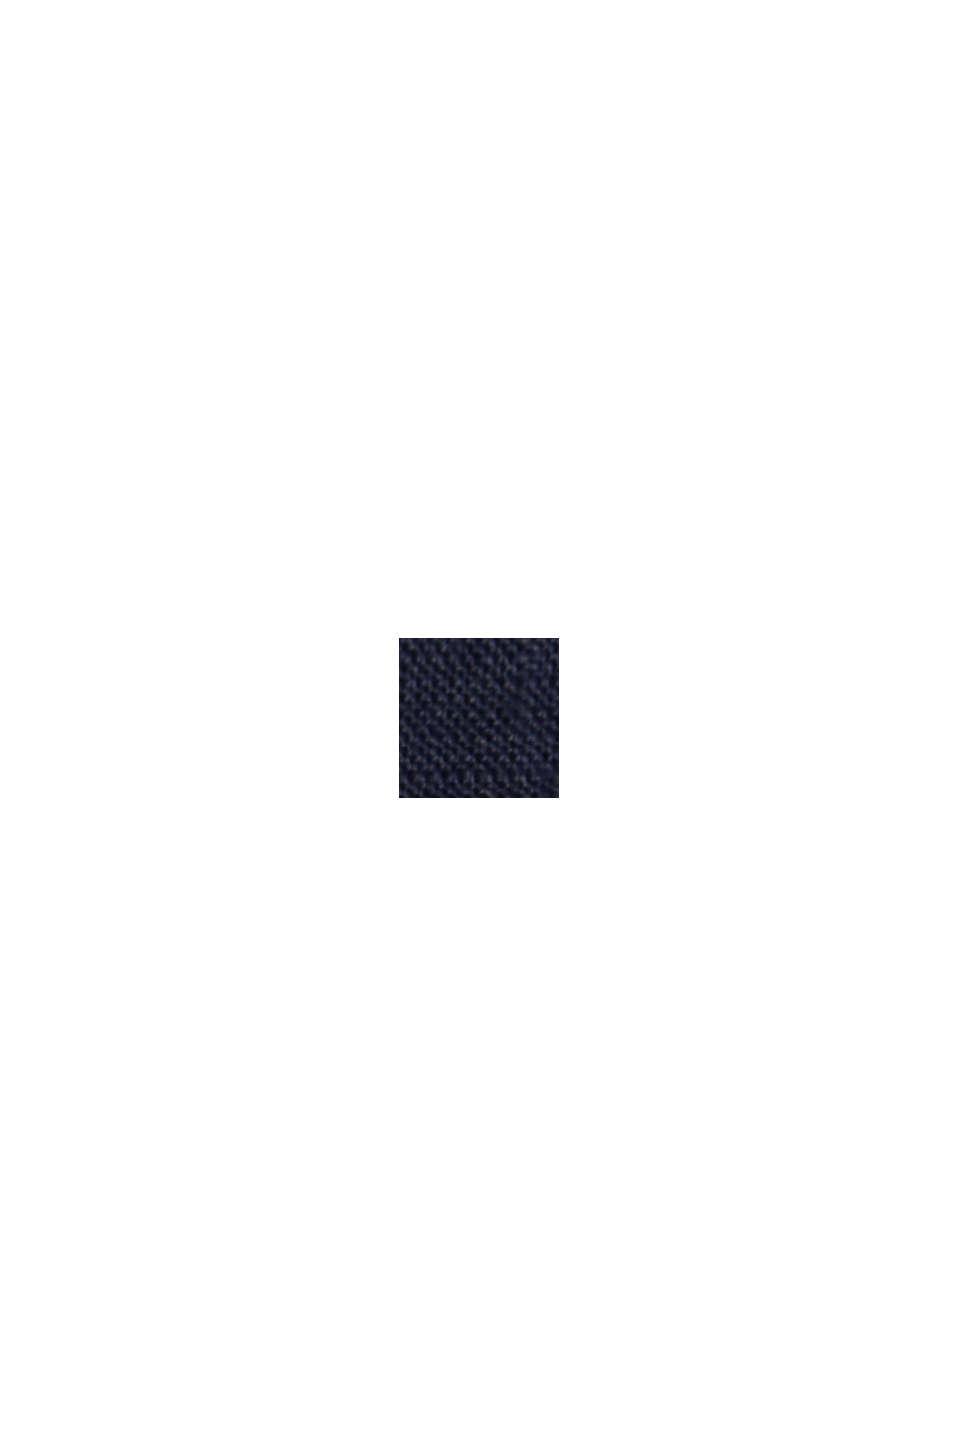 Av 100% linne: Culottebyxa med elastisk linning, NAVY, swatch